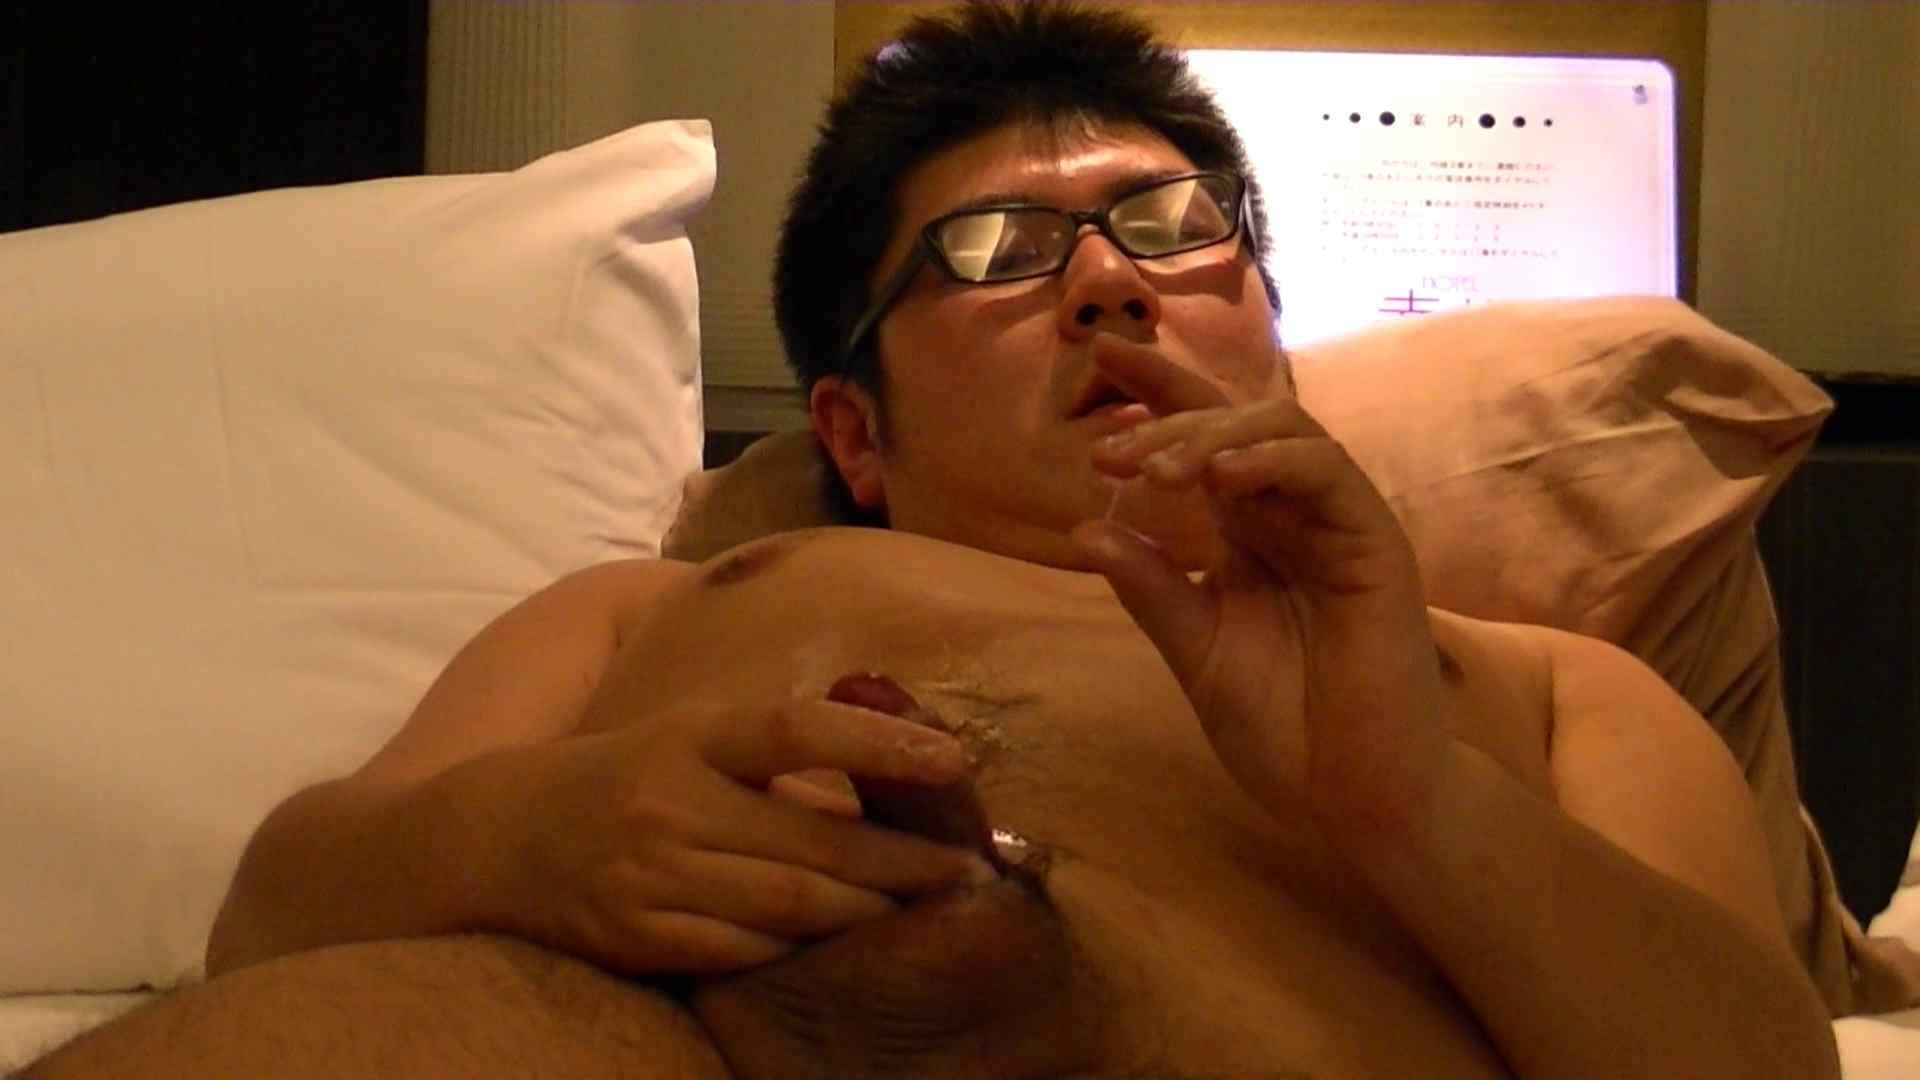 Mr.オナックスさん投稿!HD 貴方のオナニー三万円で撮影させてください。VOL.03 後編 完全無修正版 | ガチムチマッチョ系男子  106枚 25